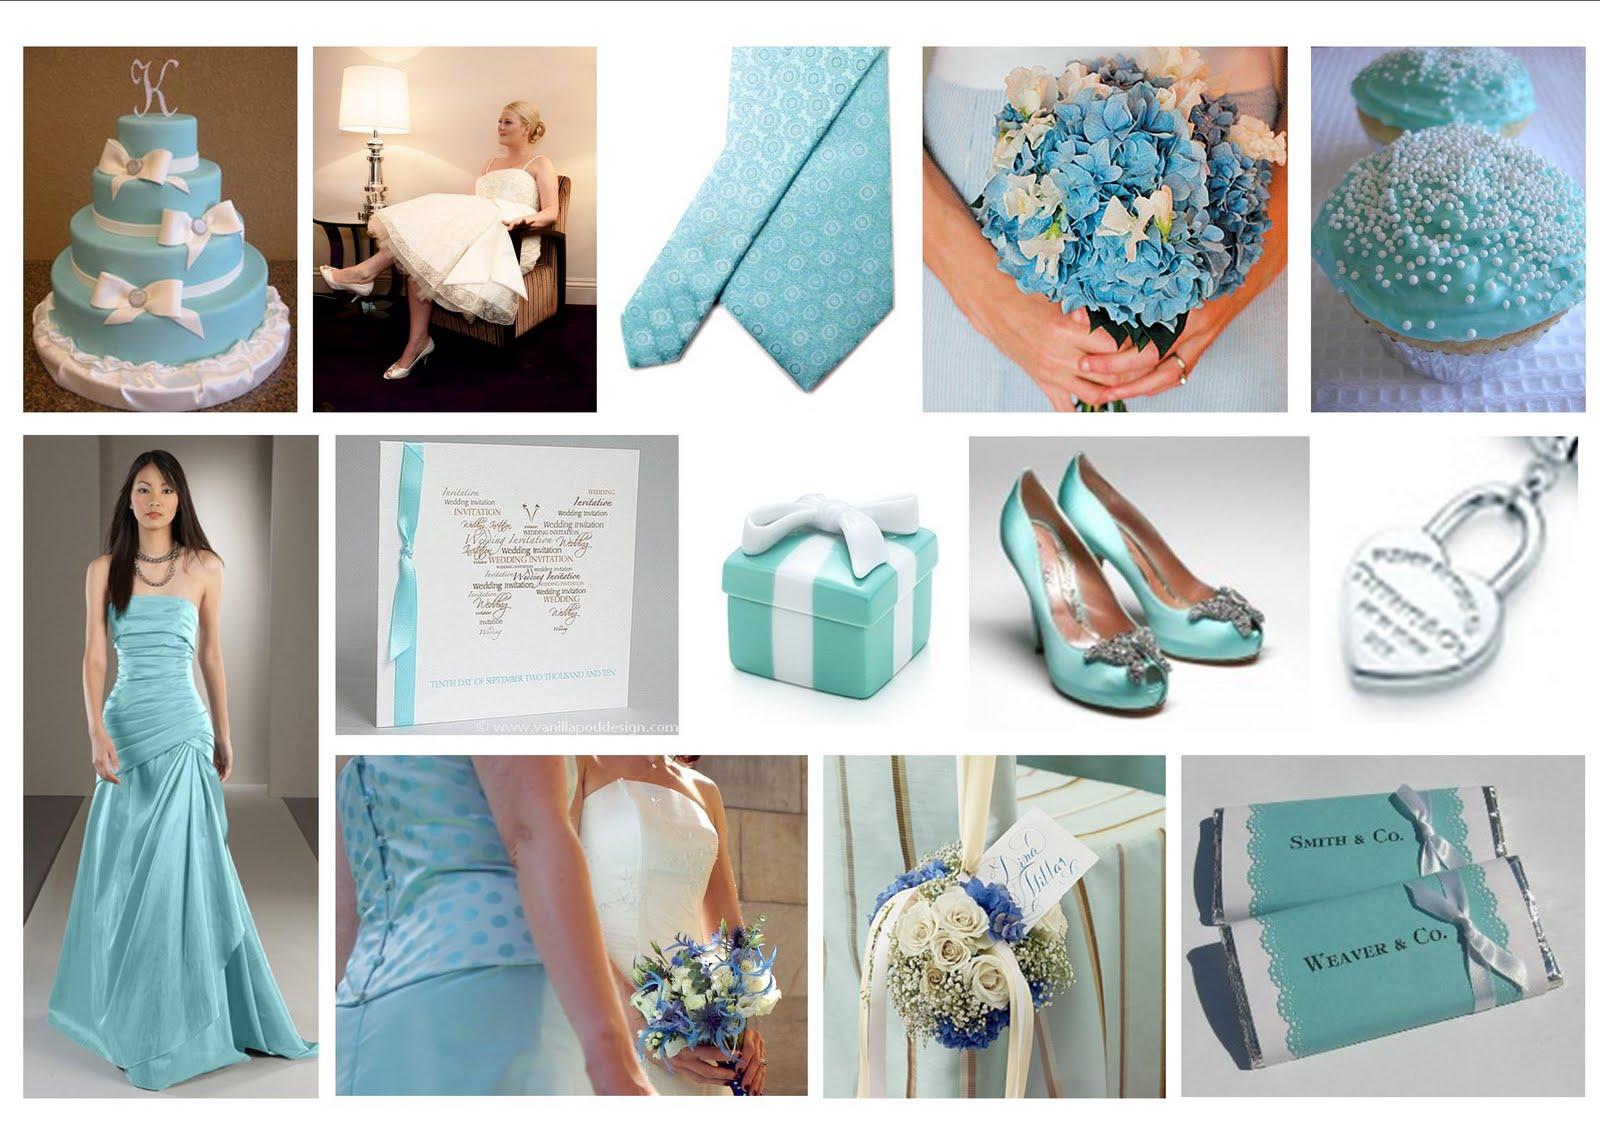 Old Fashioned Teal Colour Wedding Theme Ideas - The Wedding Ideas ...